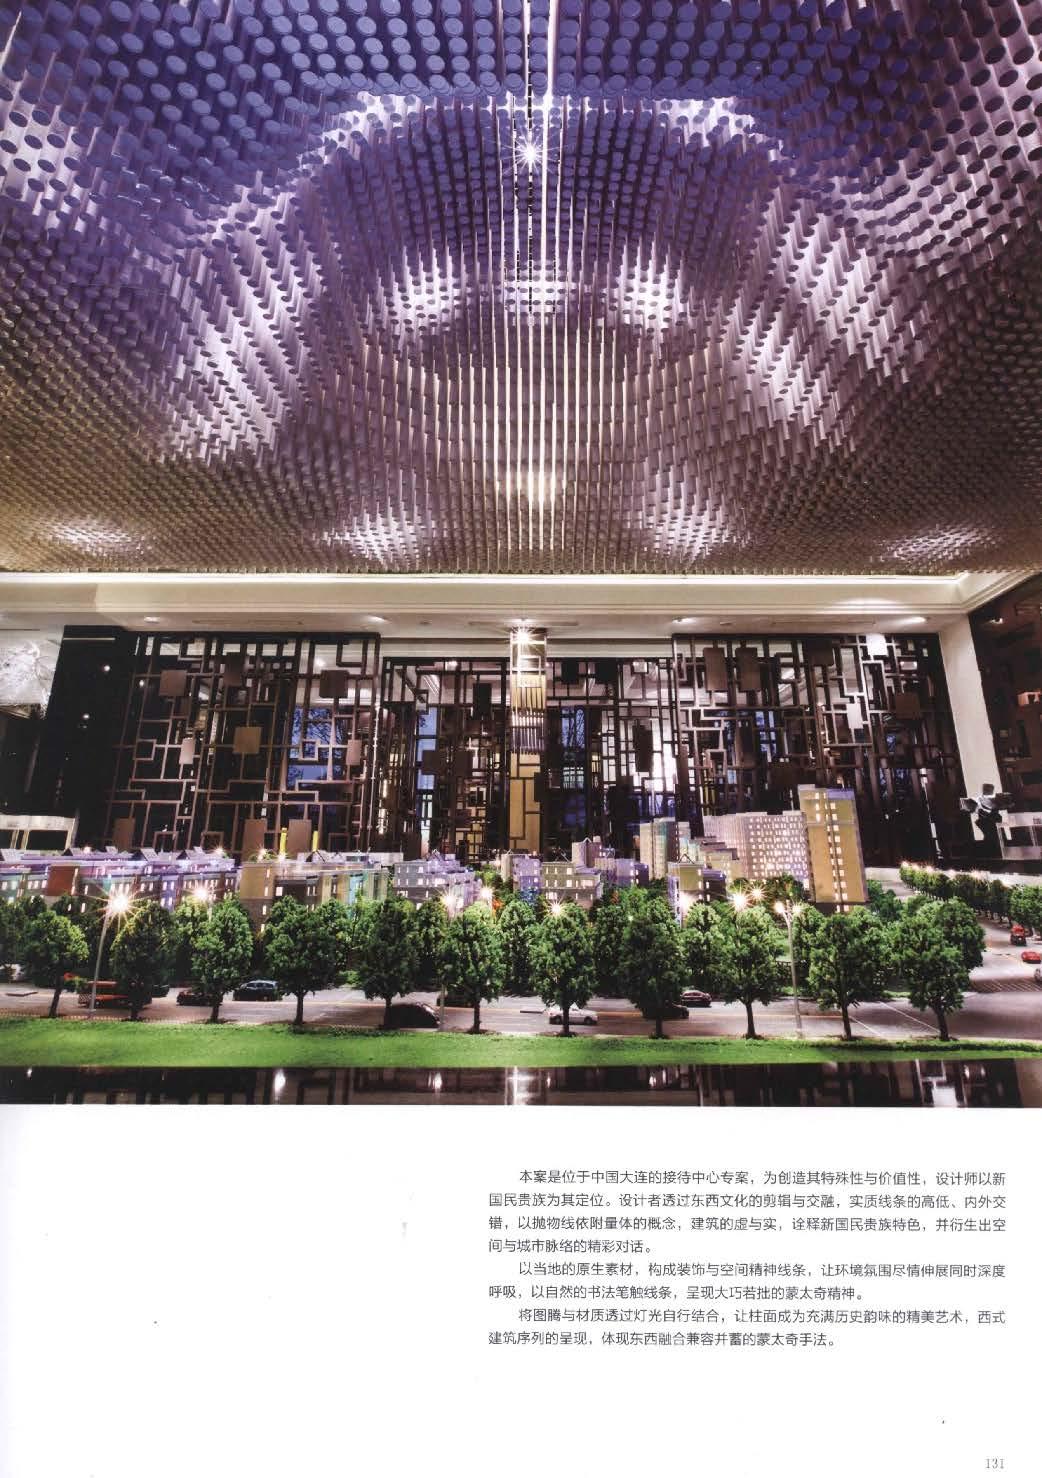 H073 东方风情 会所、餐饮细部解析_Page_129.jpg